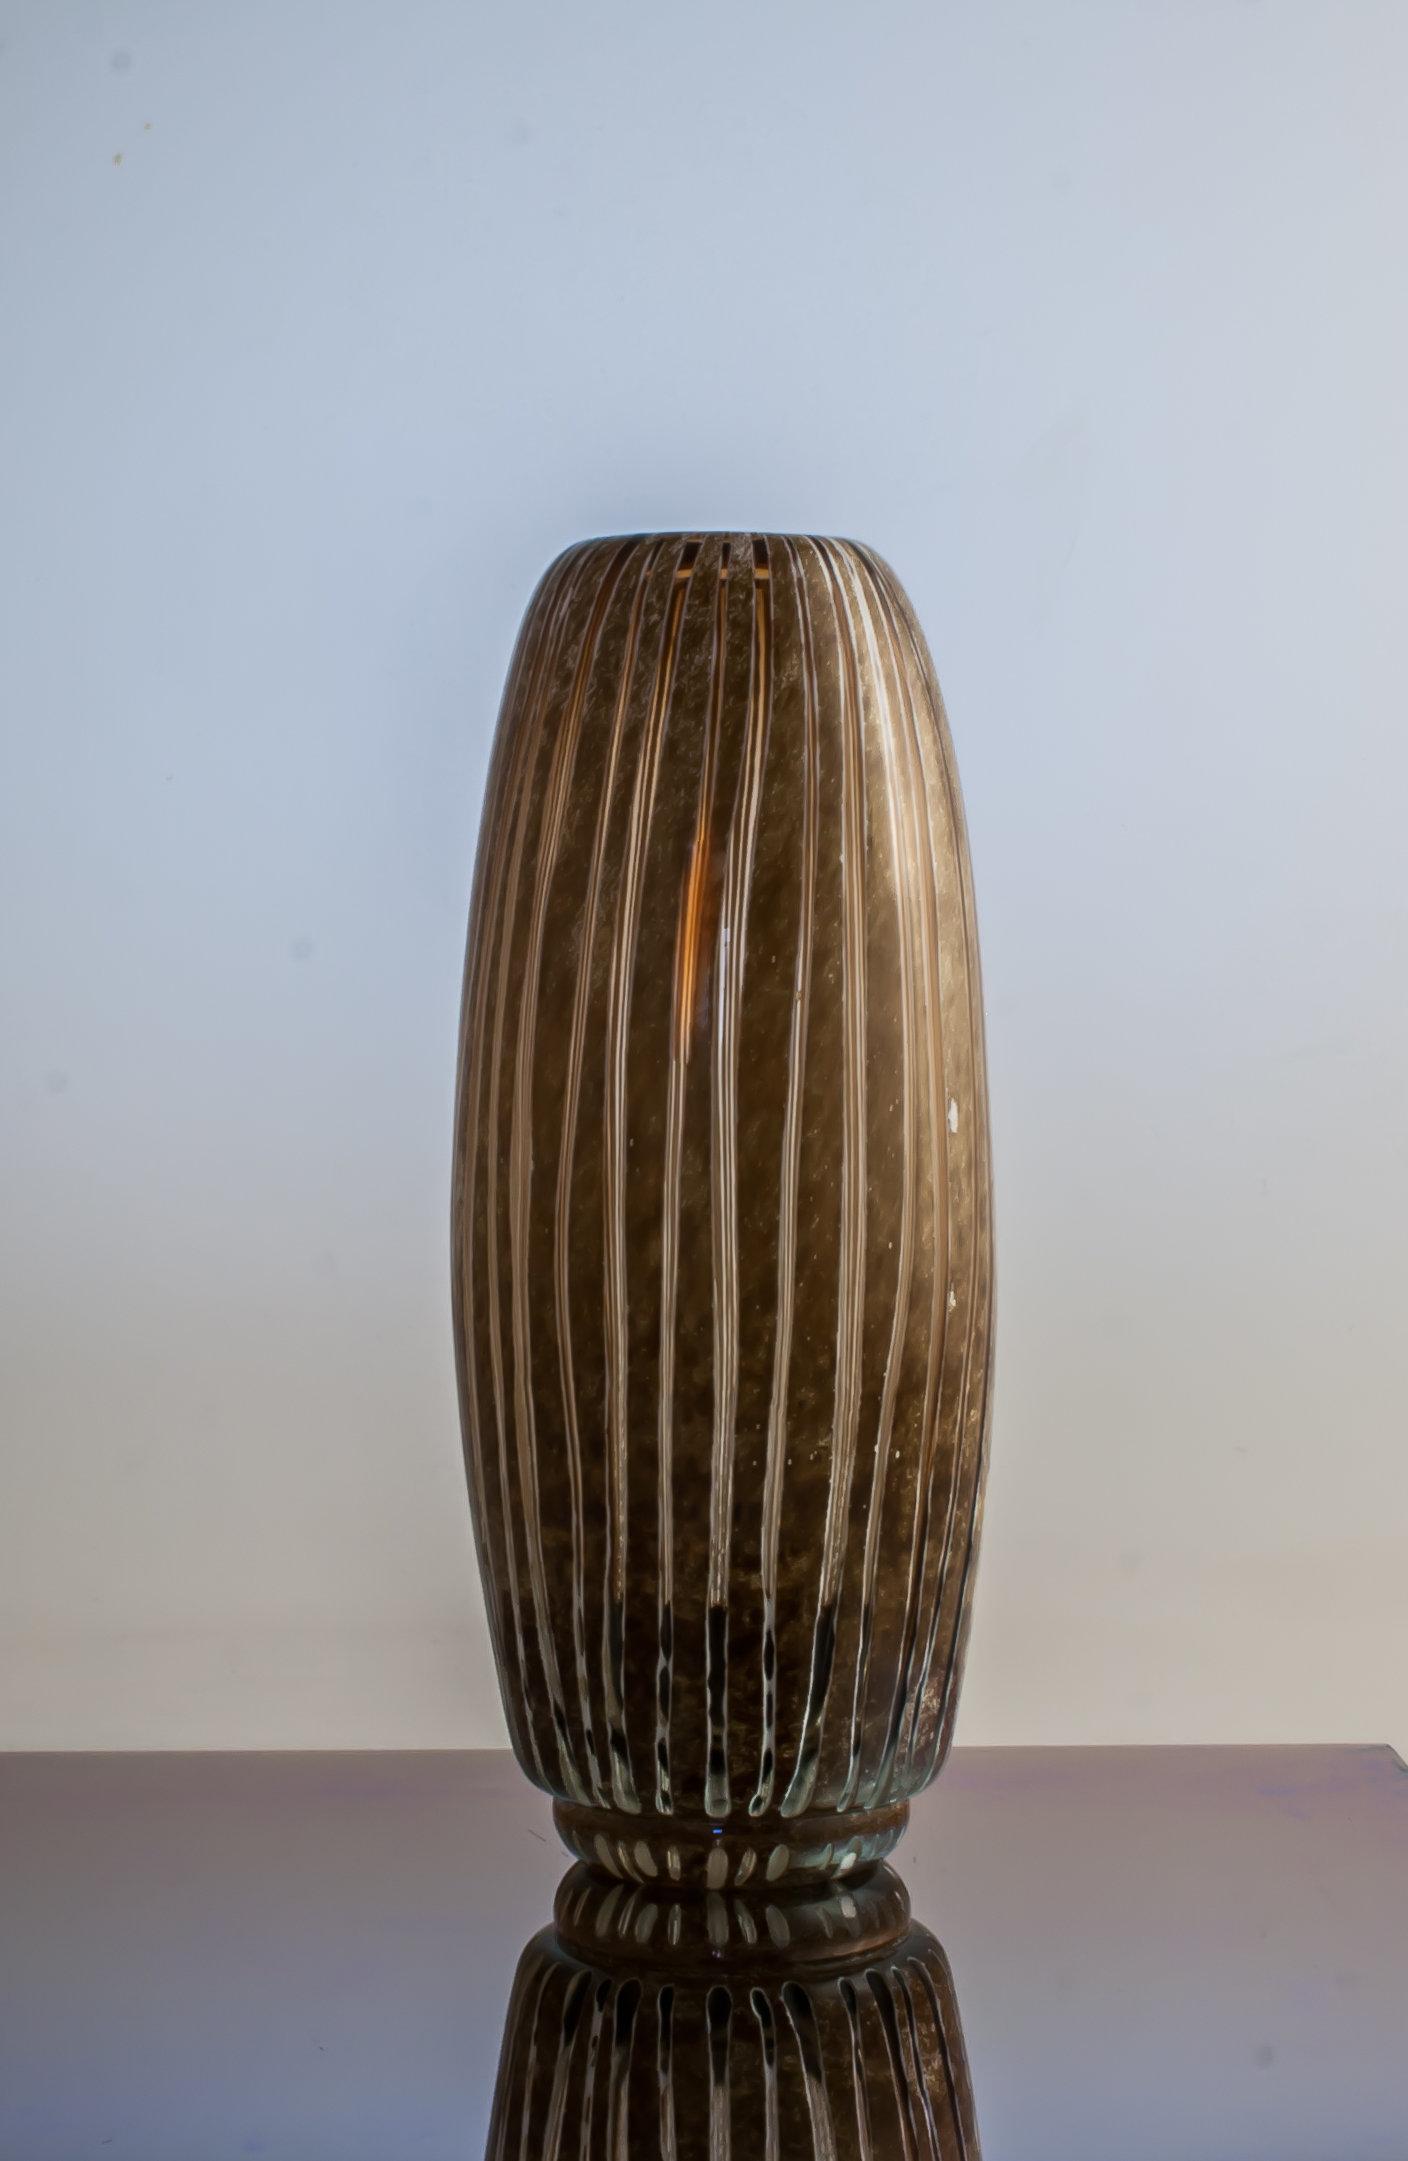 Barrel Vase By Richard S Jones Art Glass Vase Artful Home